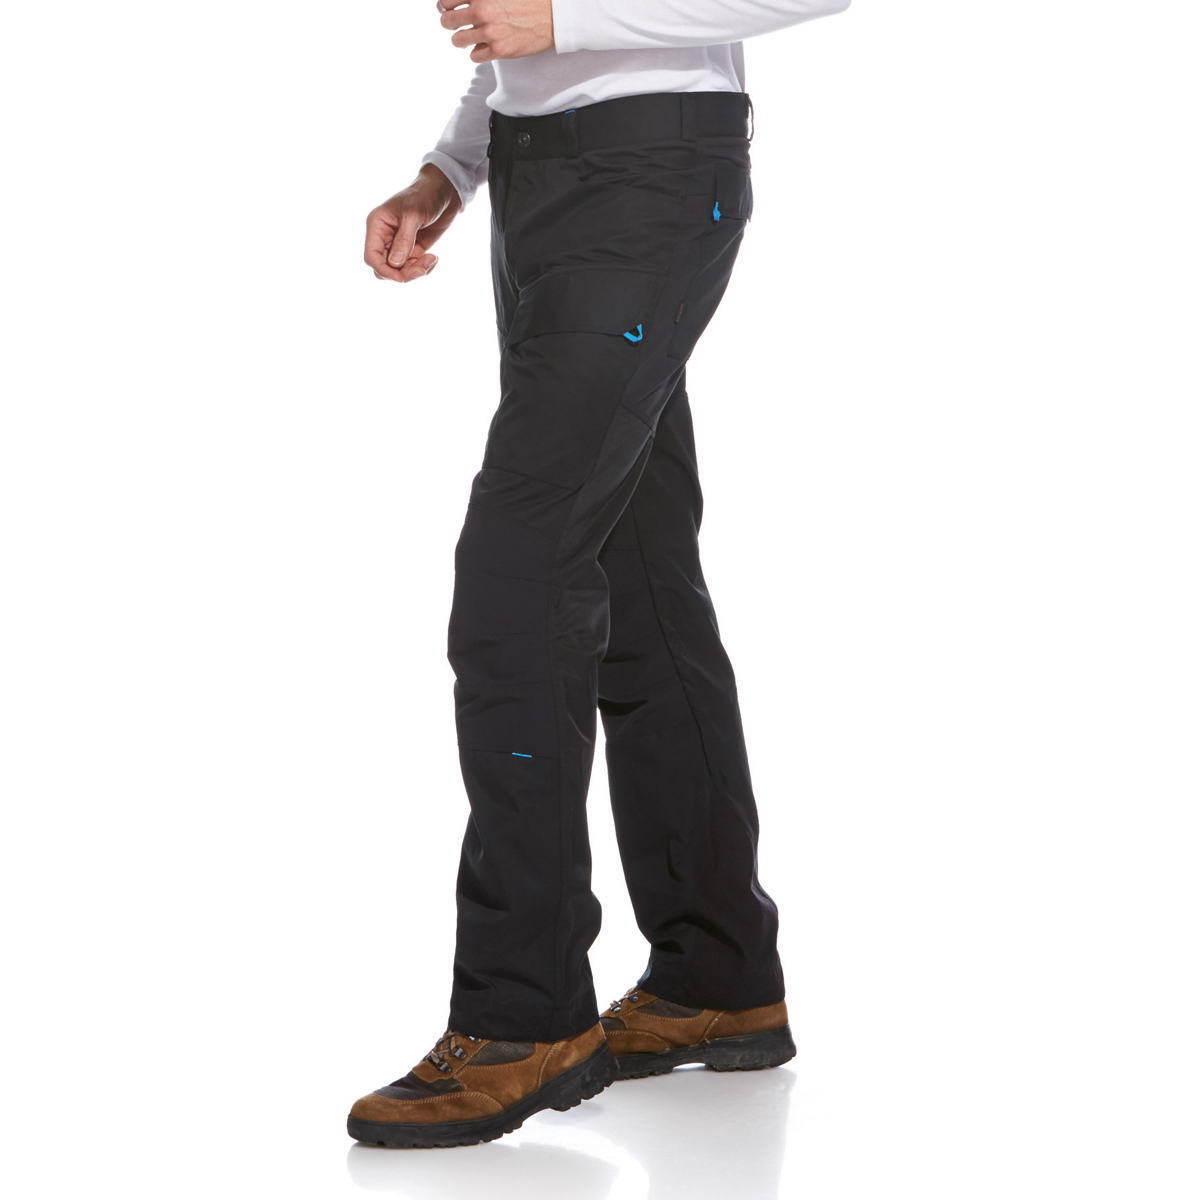 Tatonka M's Gründale M's Tatonka Pants Gr.52 Trekking Outdoor Wander Hose schwarz NEU 30c787